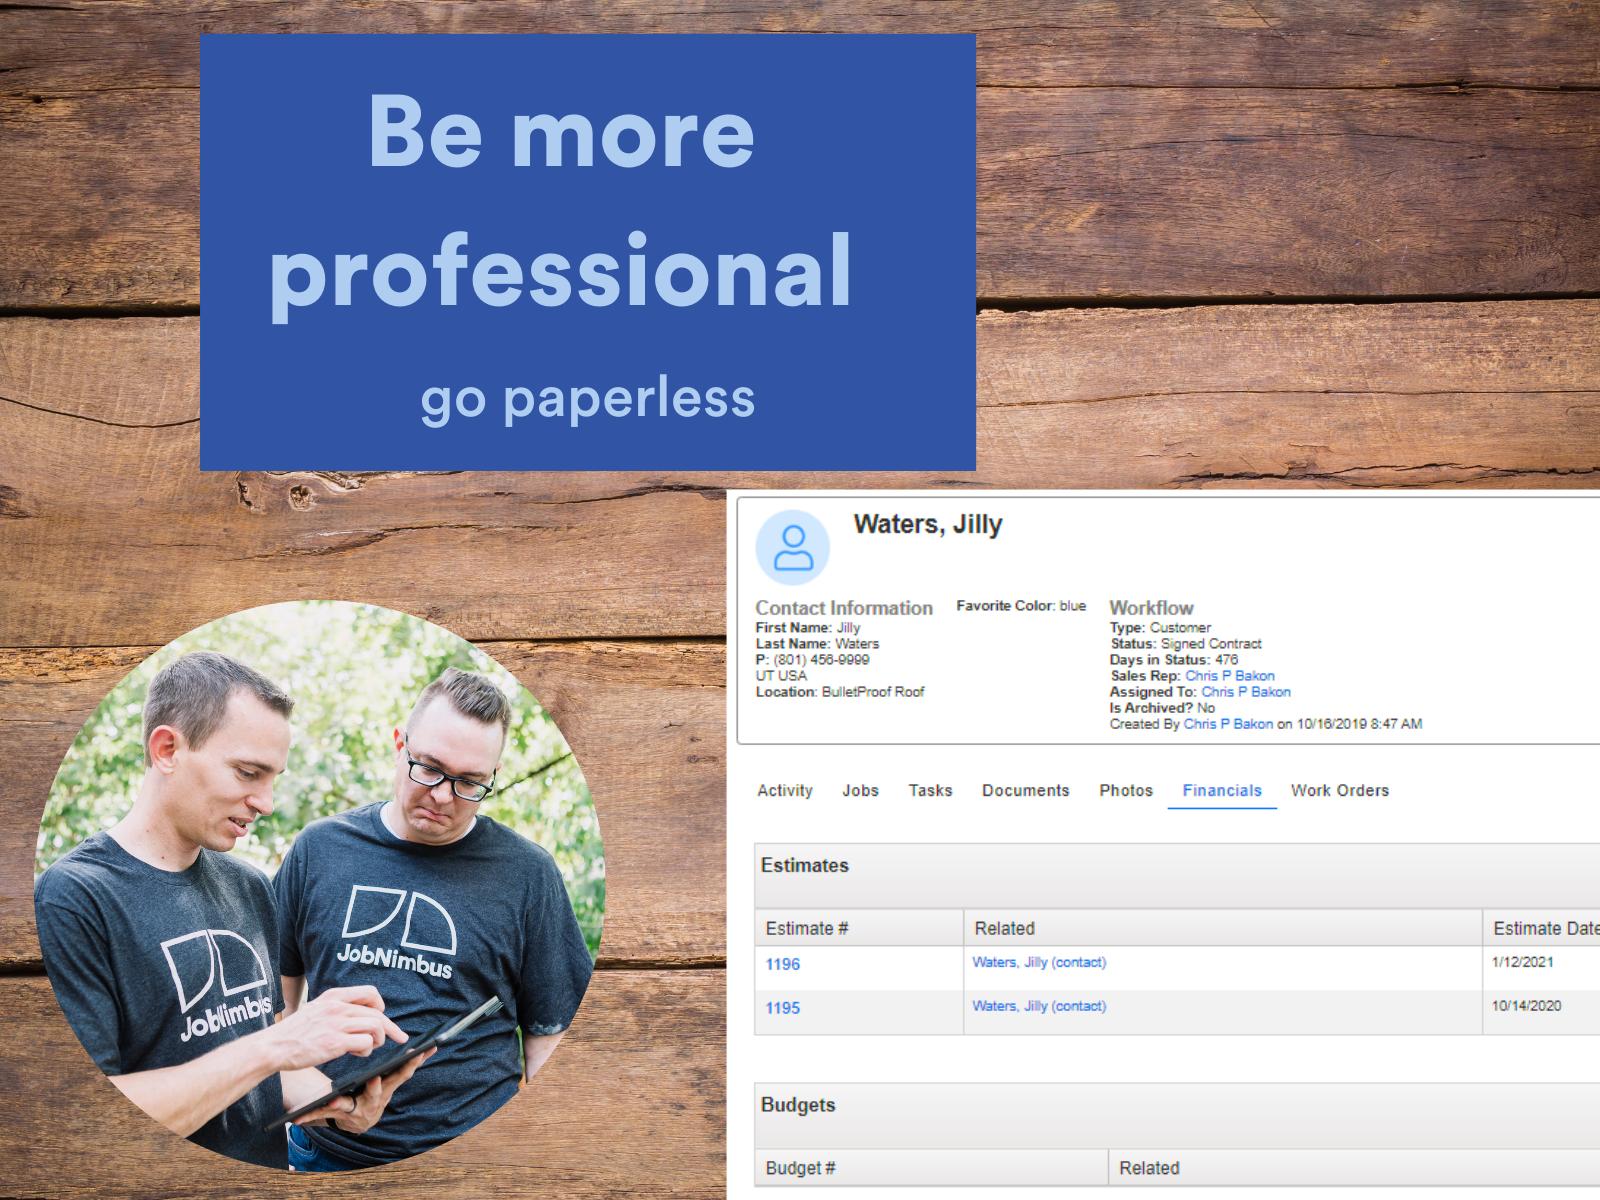 JobNimbus Software - Find information quickly using paperless estimates, invoices etc...